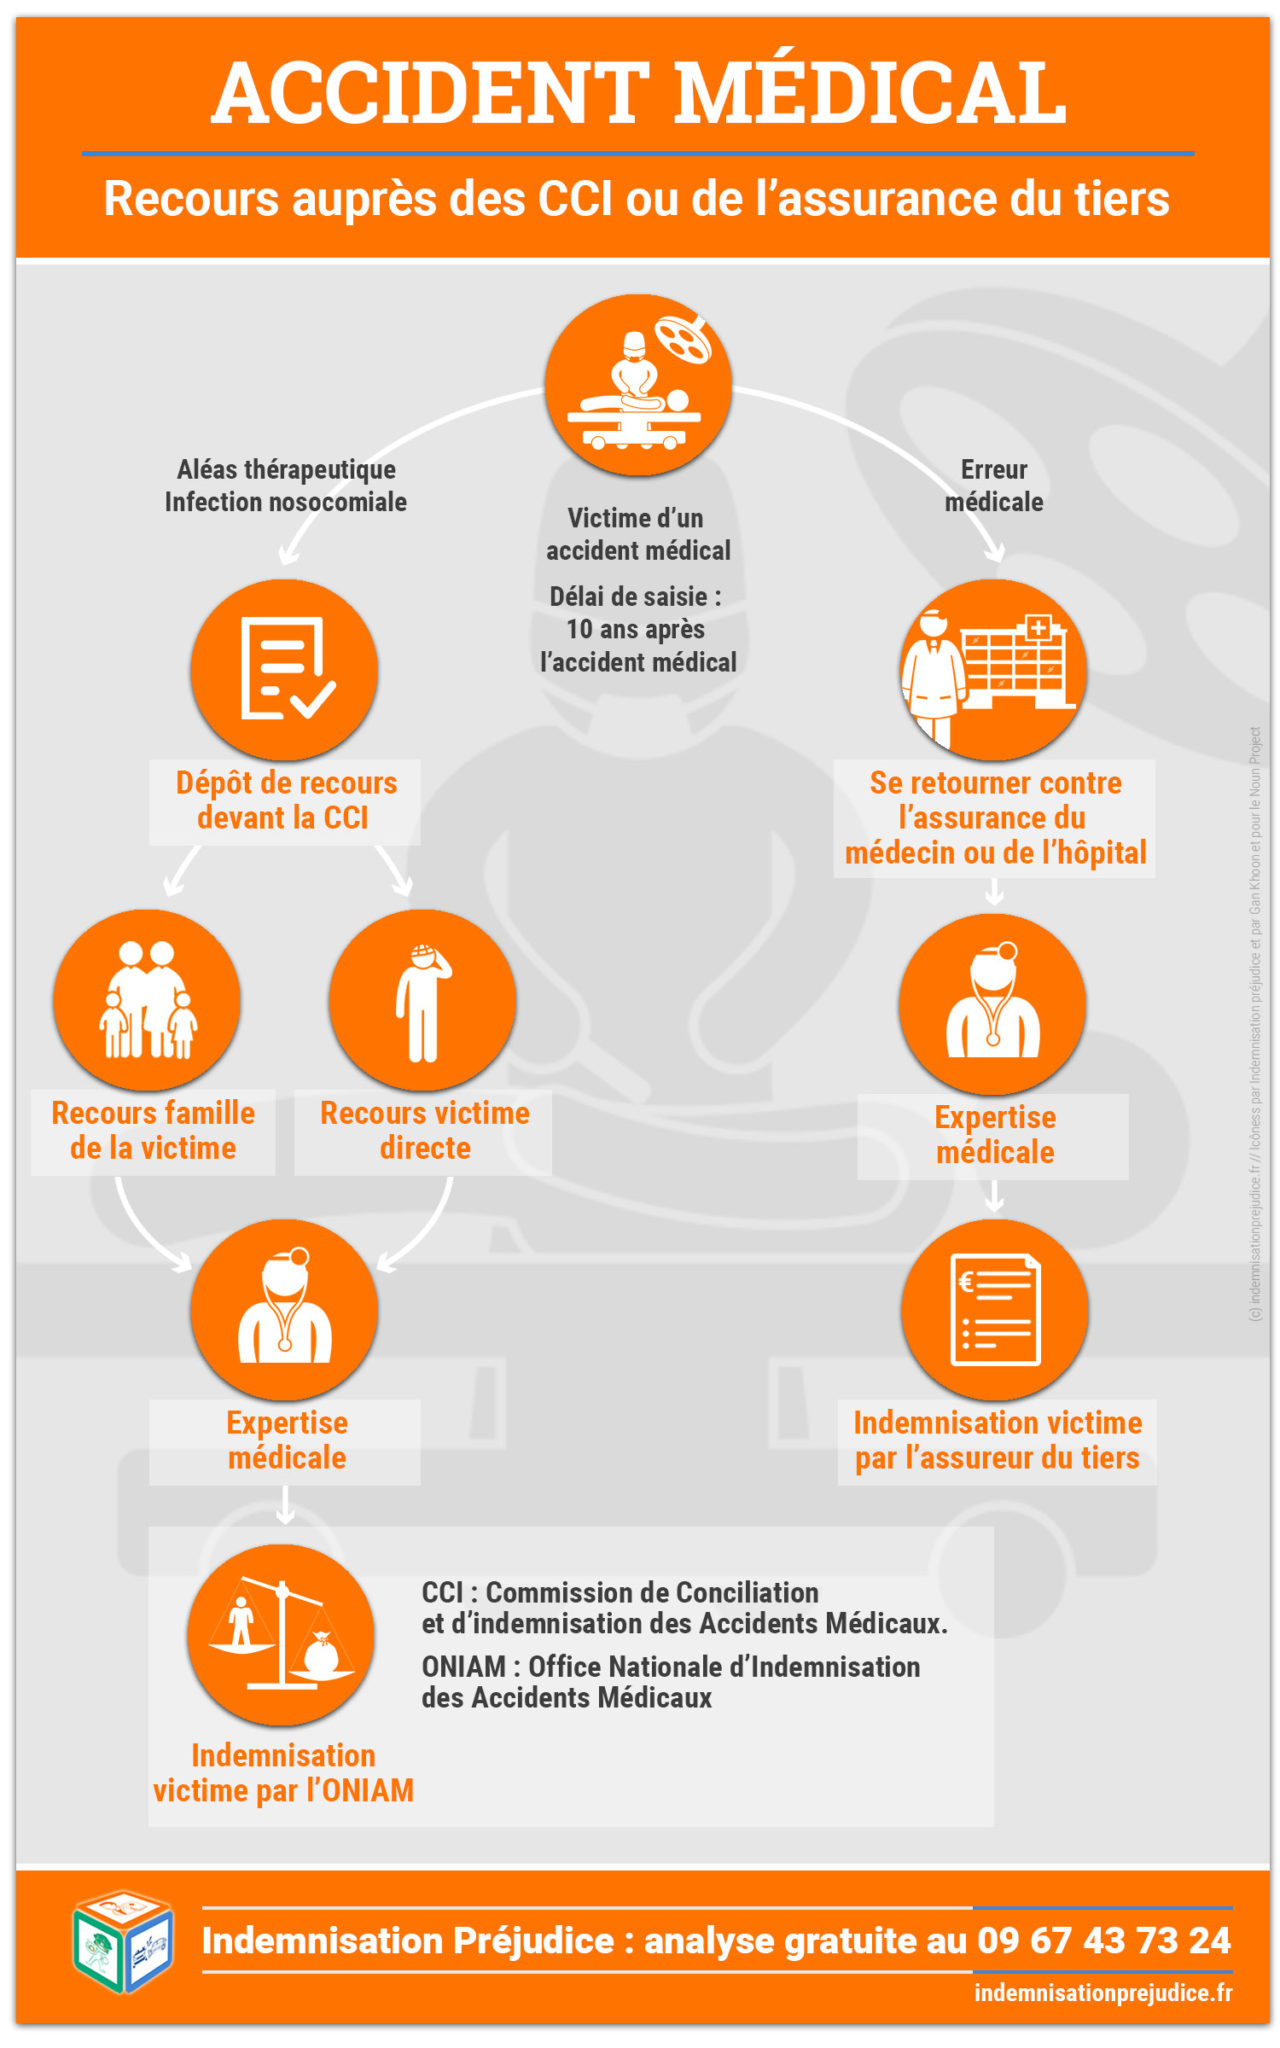 idemnisation préjudice -accident médical - infographie